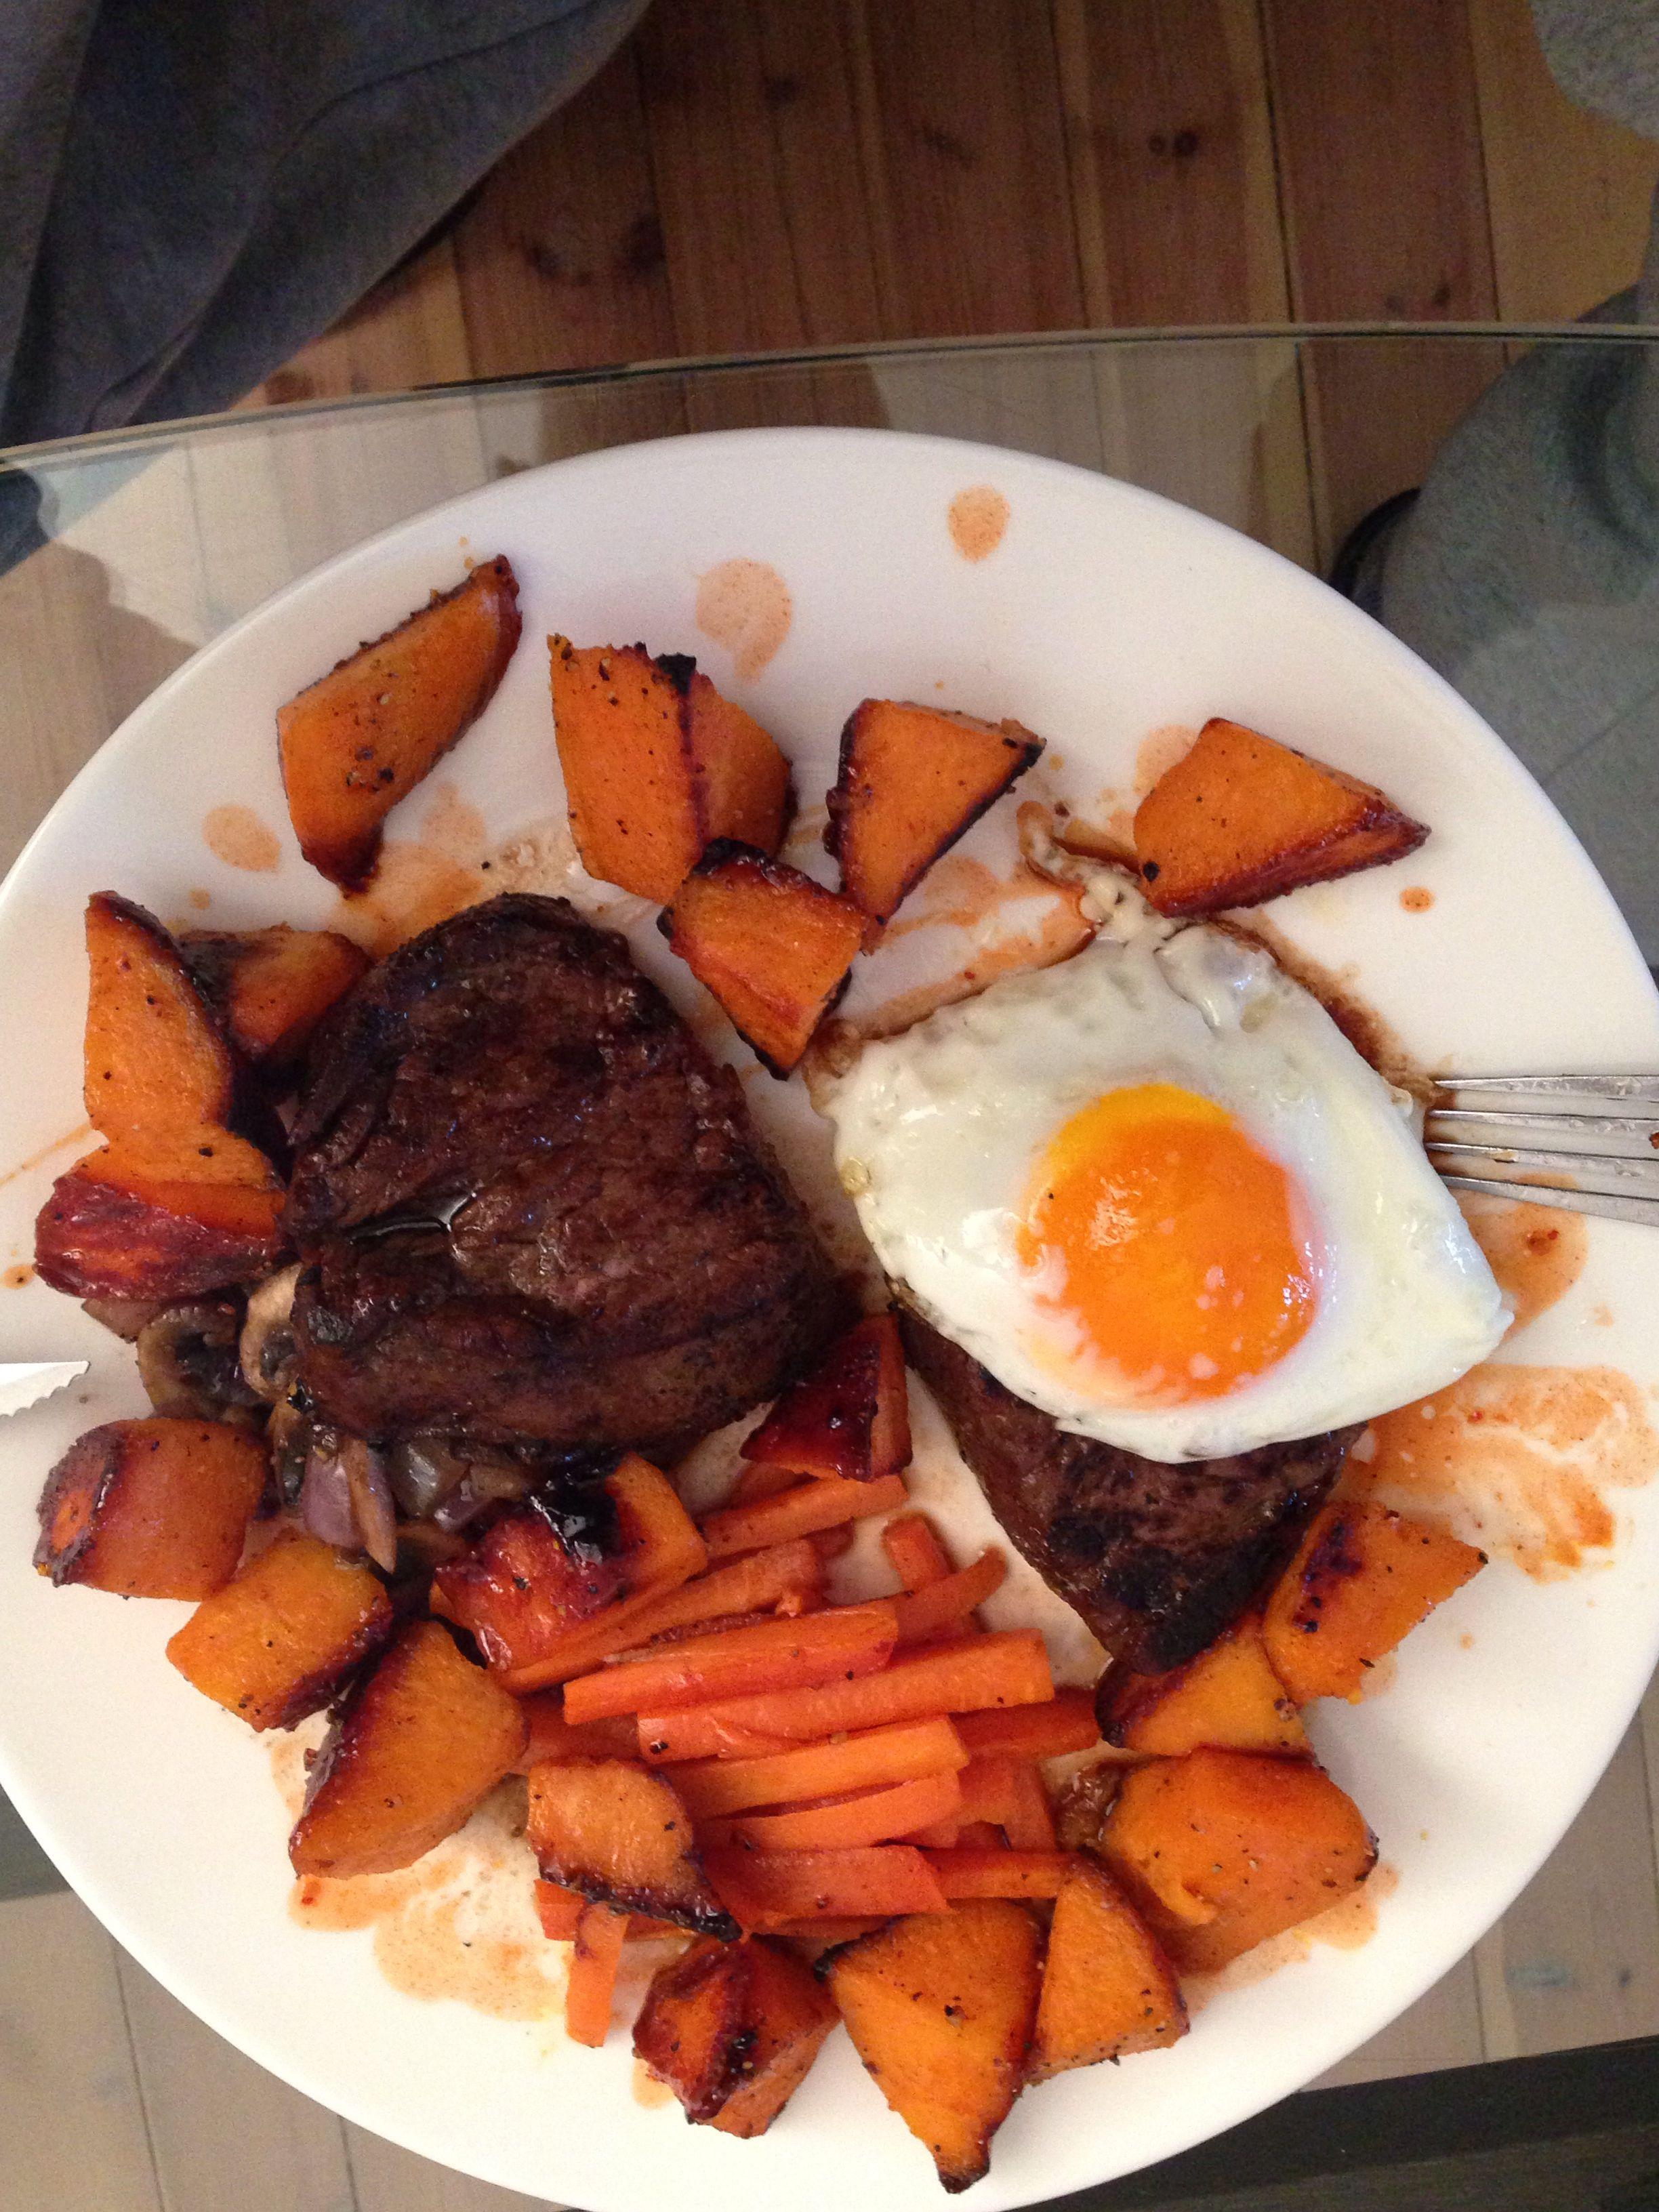 Steak& egg served with roast sweet potatoes